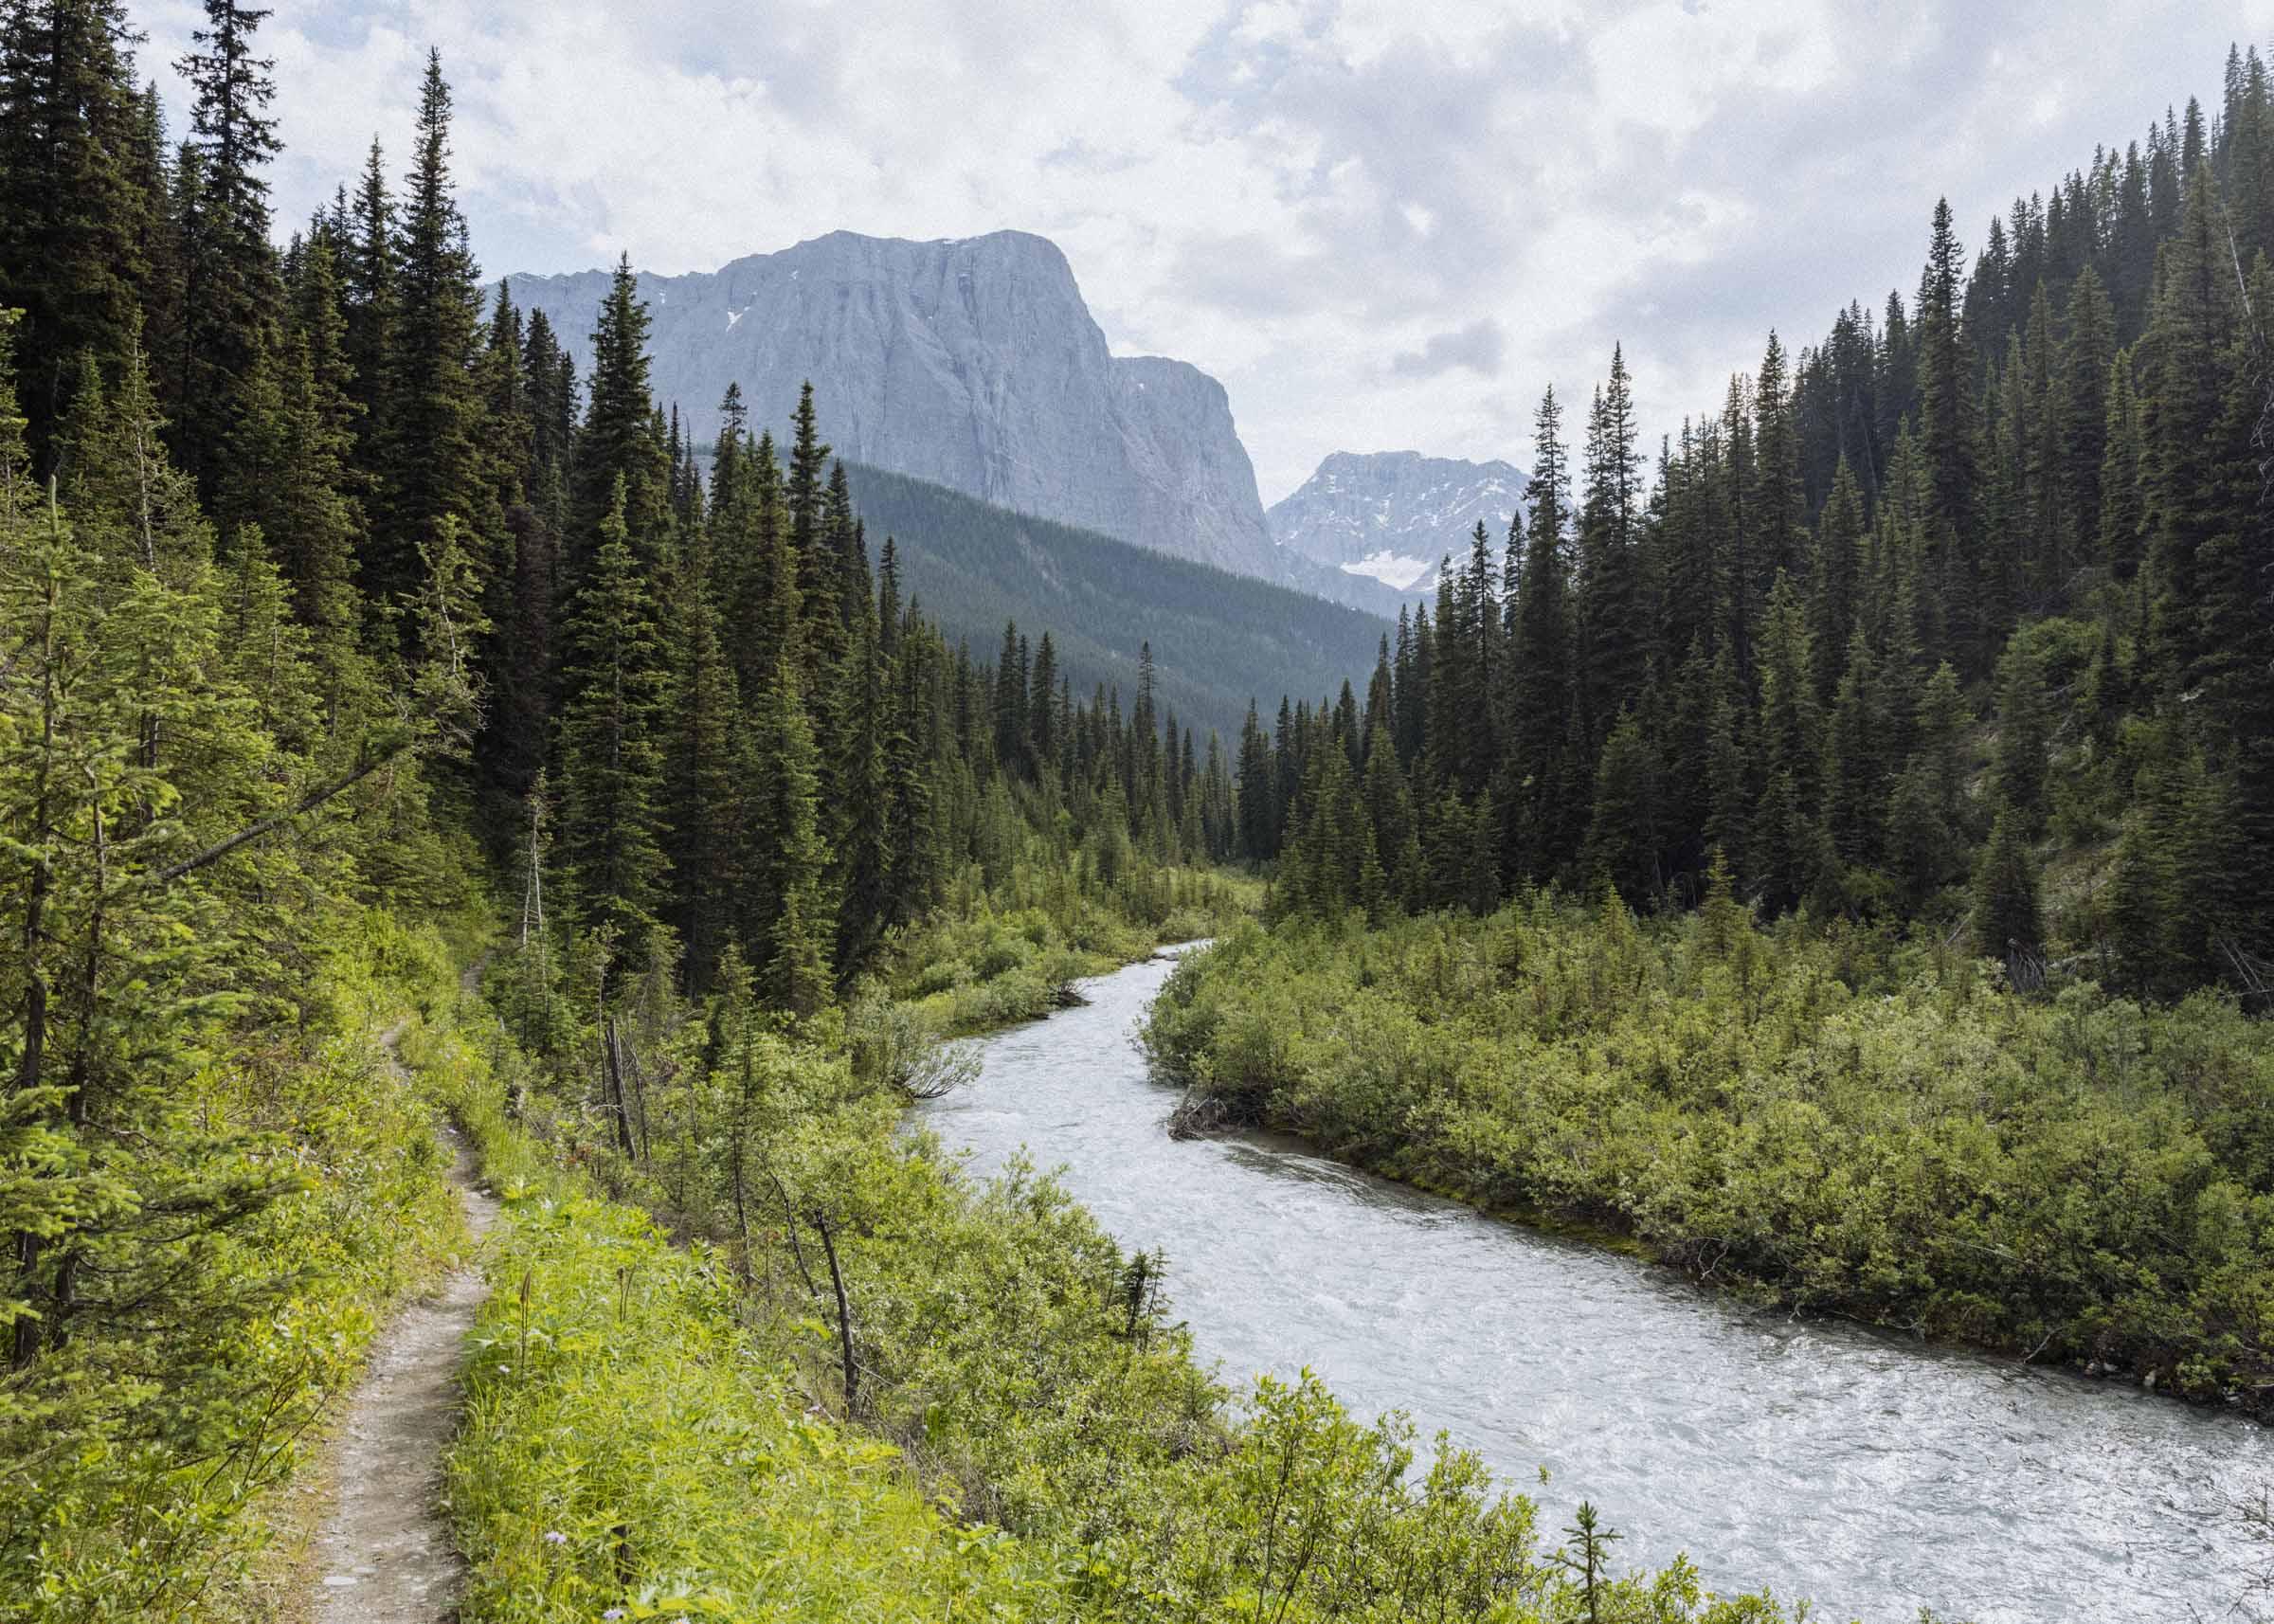 Hiking the Rockwall Trail